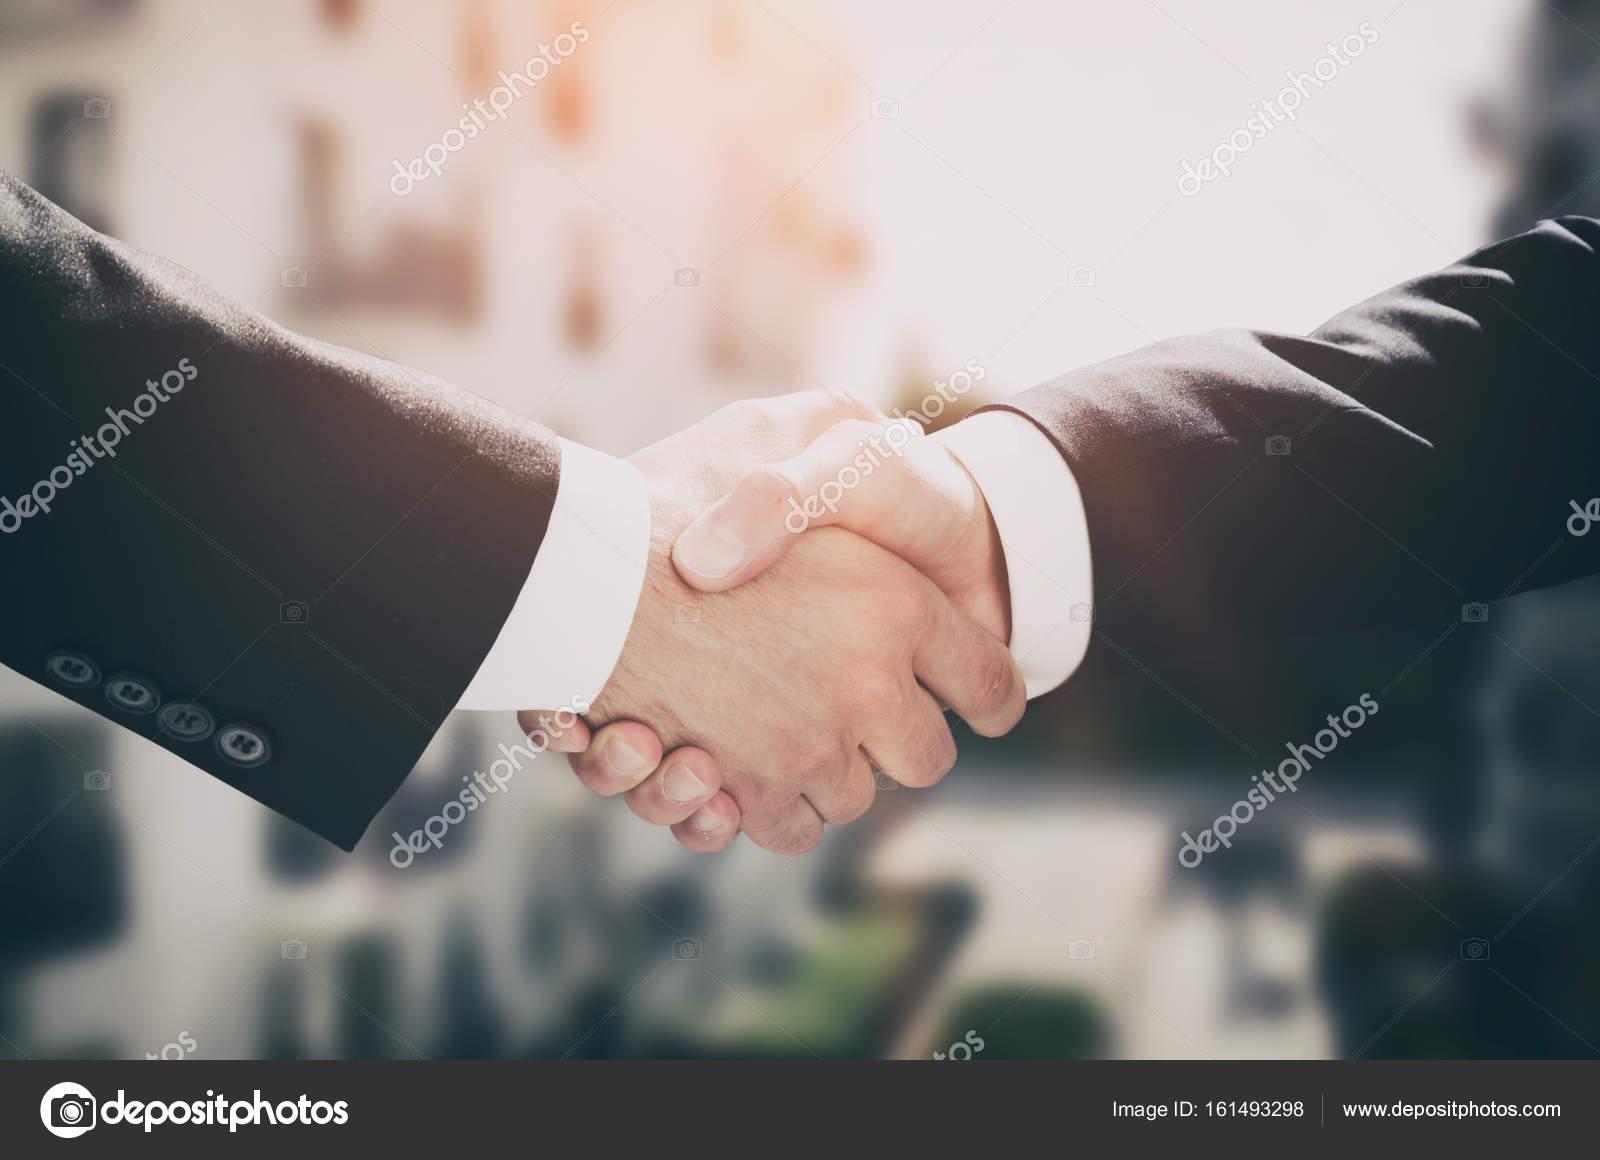 Business Handshake, Geschäftsvereinbarung Menschen — Stockfoto ...